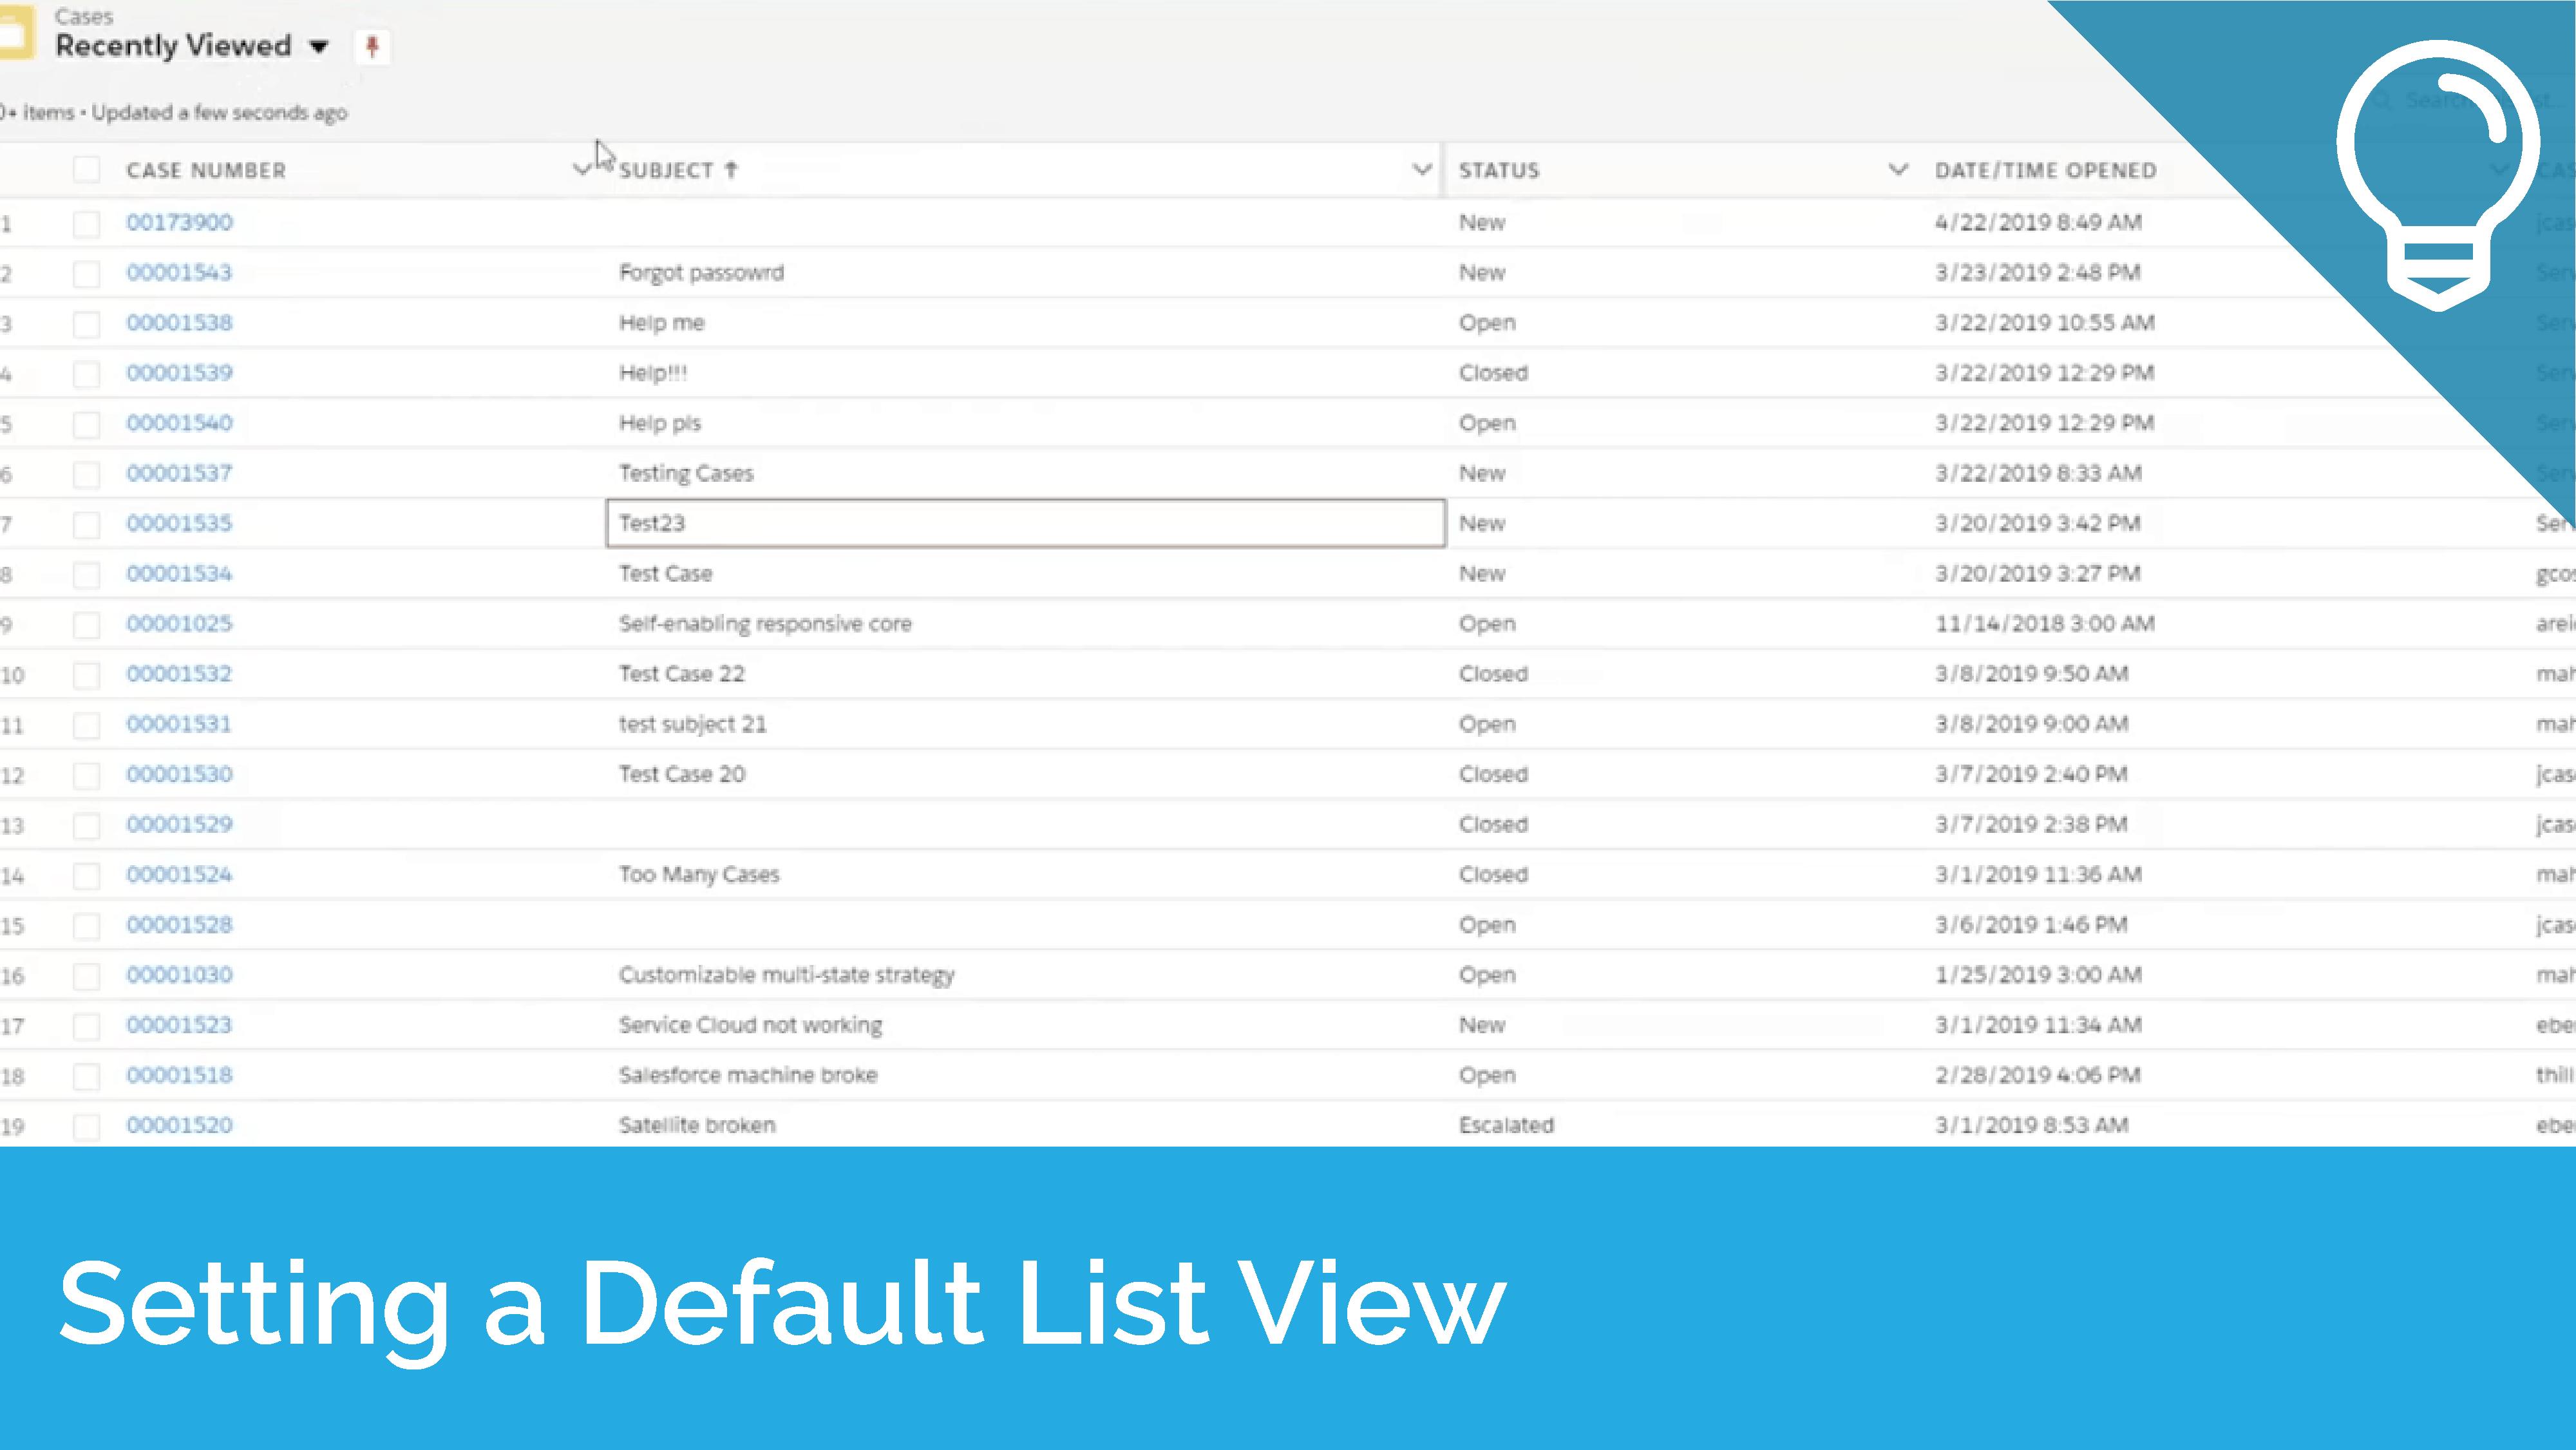 Setting a Default List View